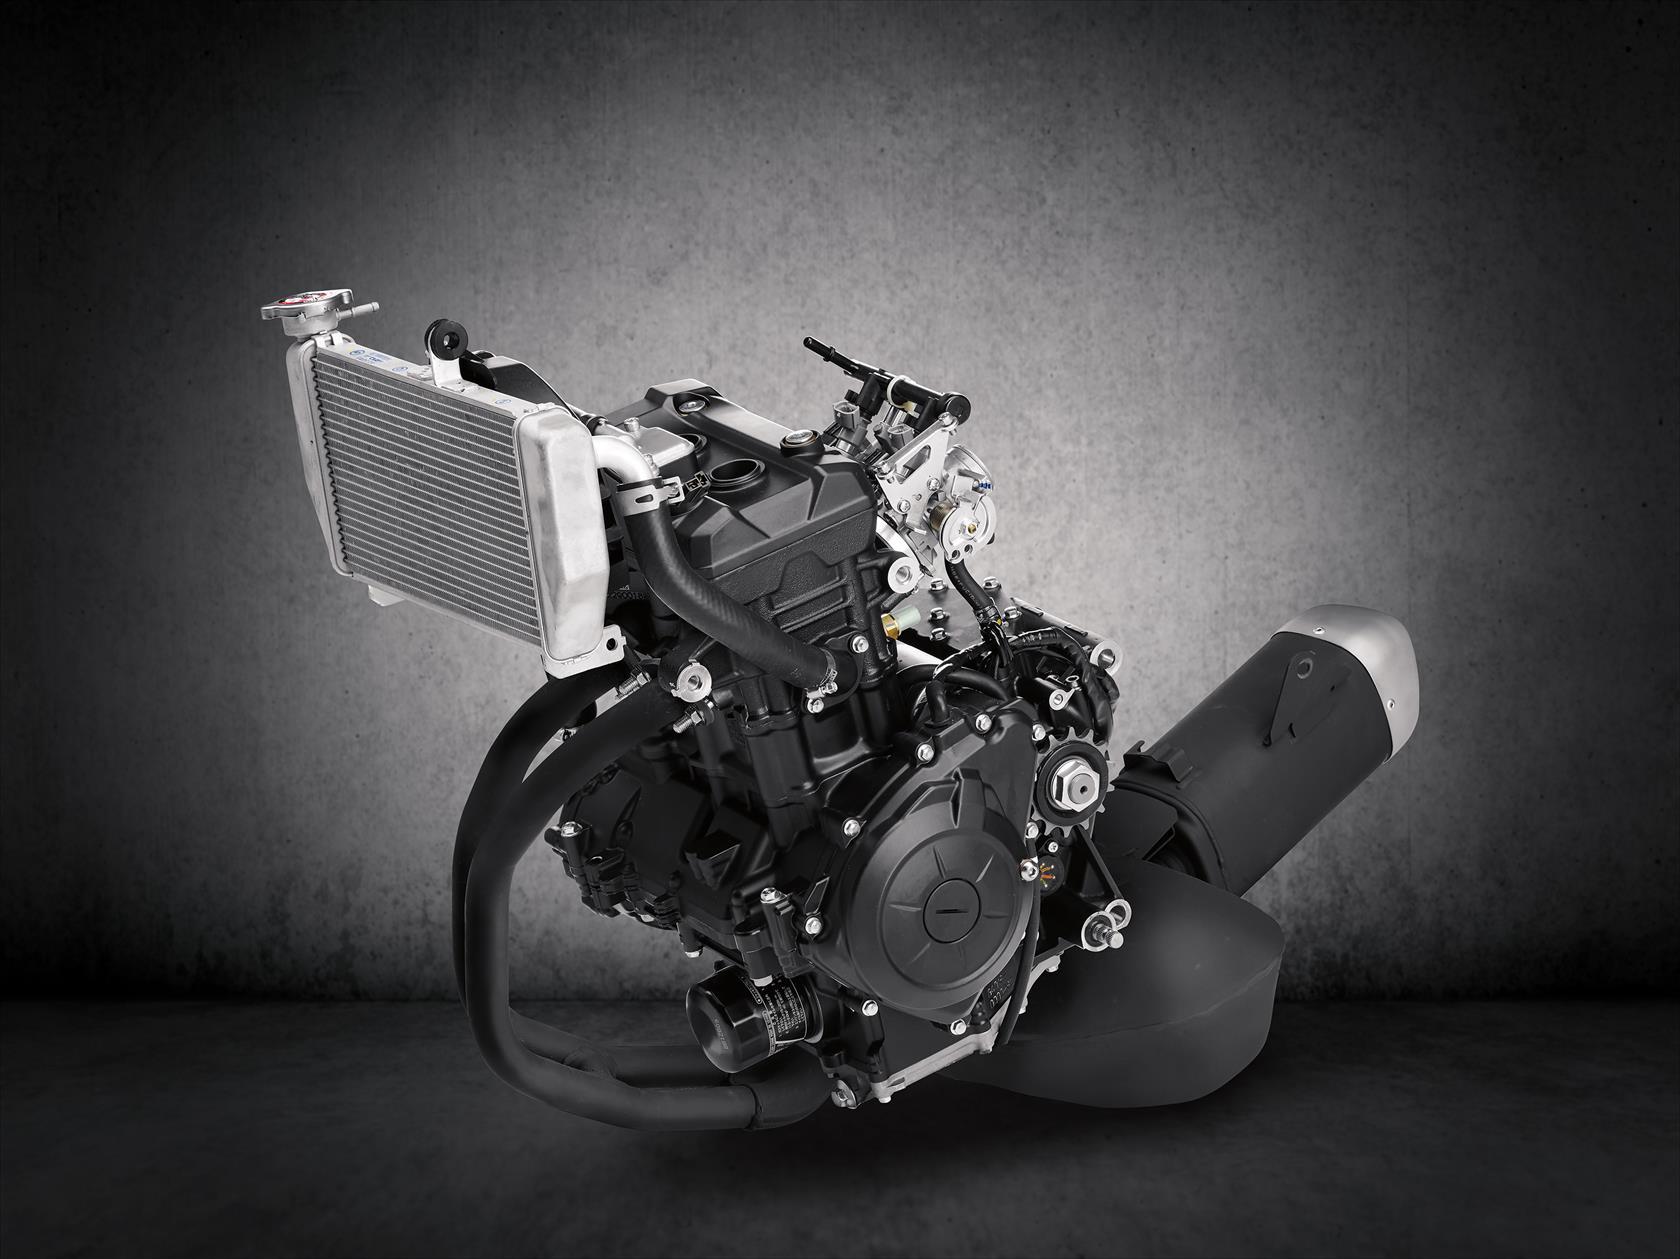 yahama r3 engine automation bio